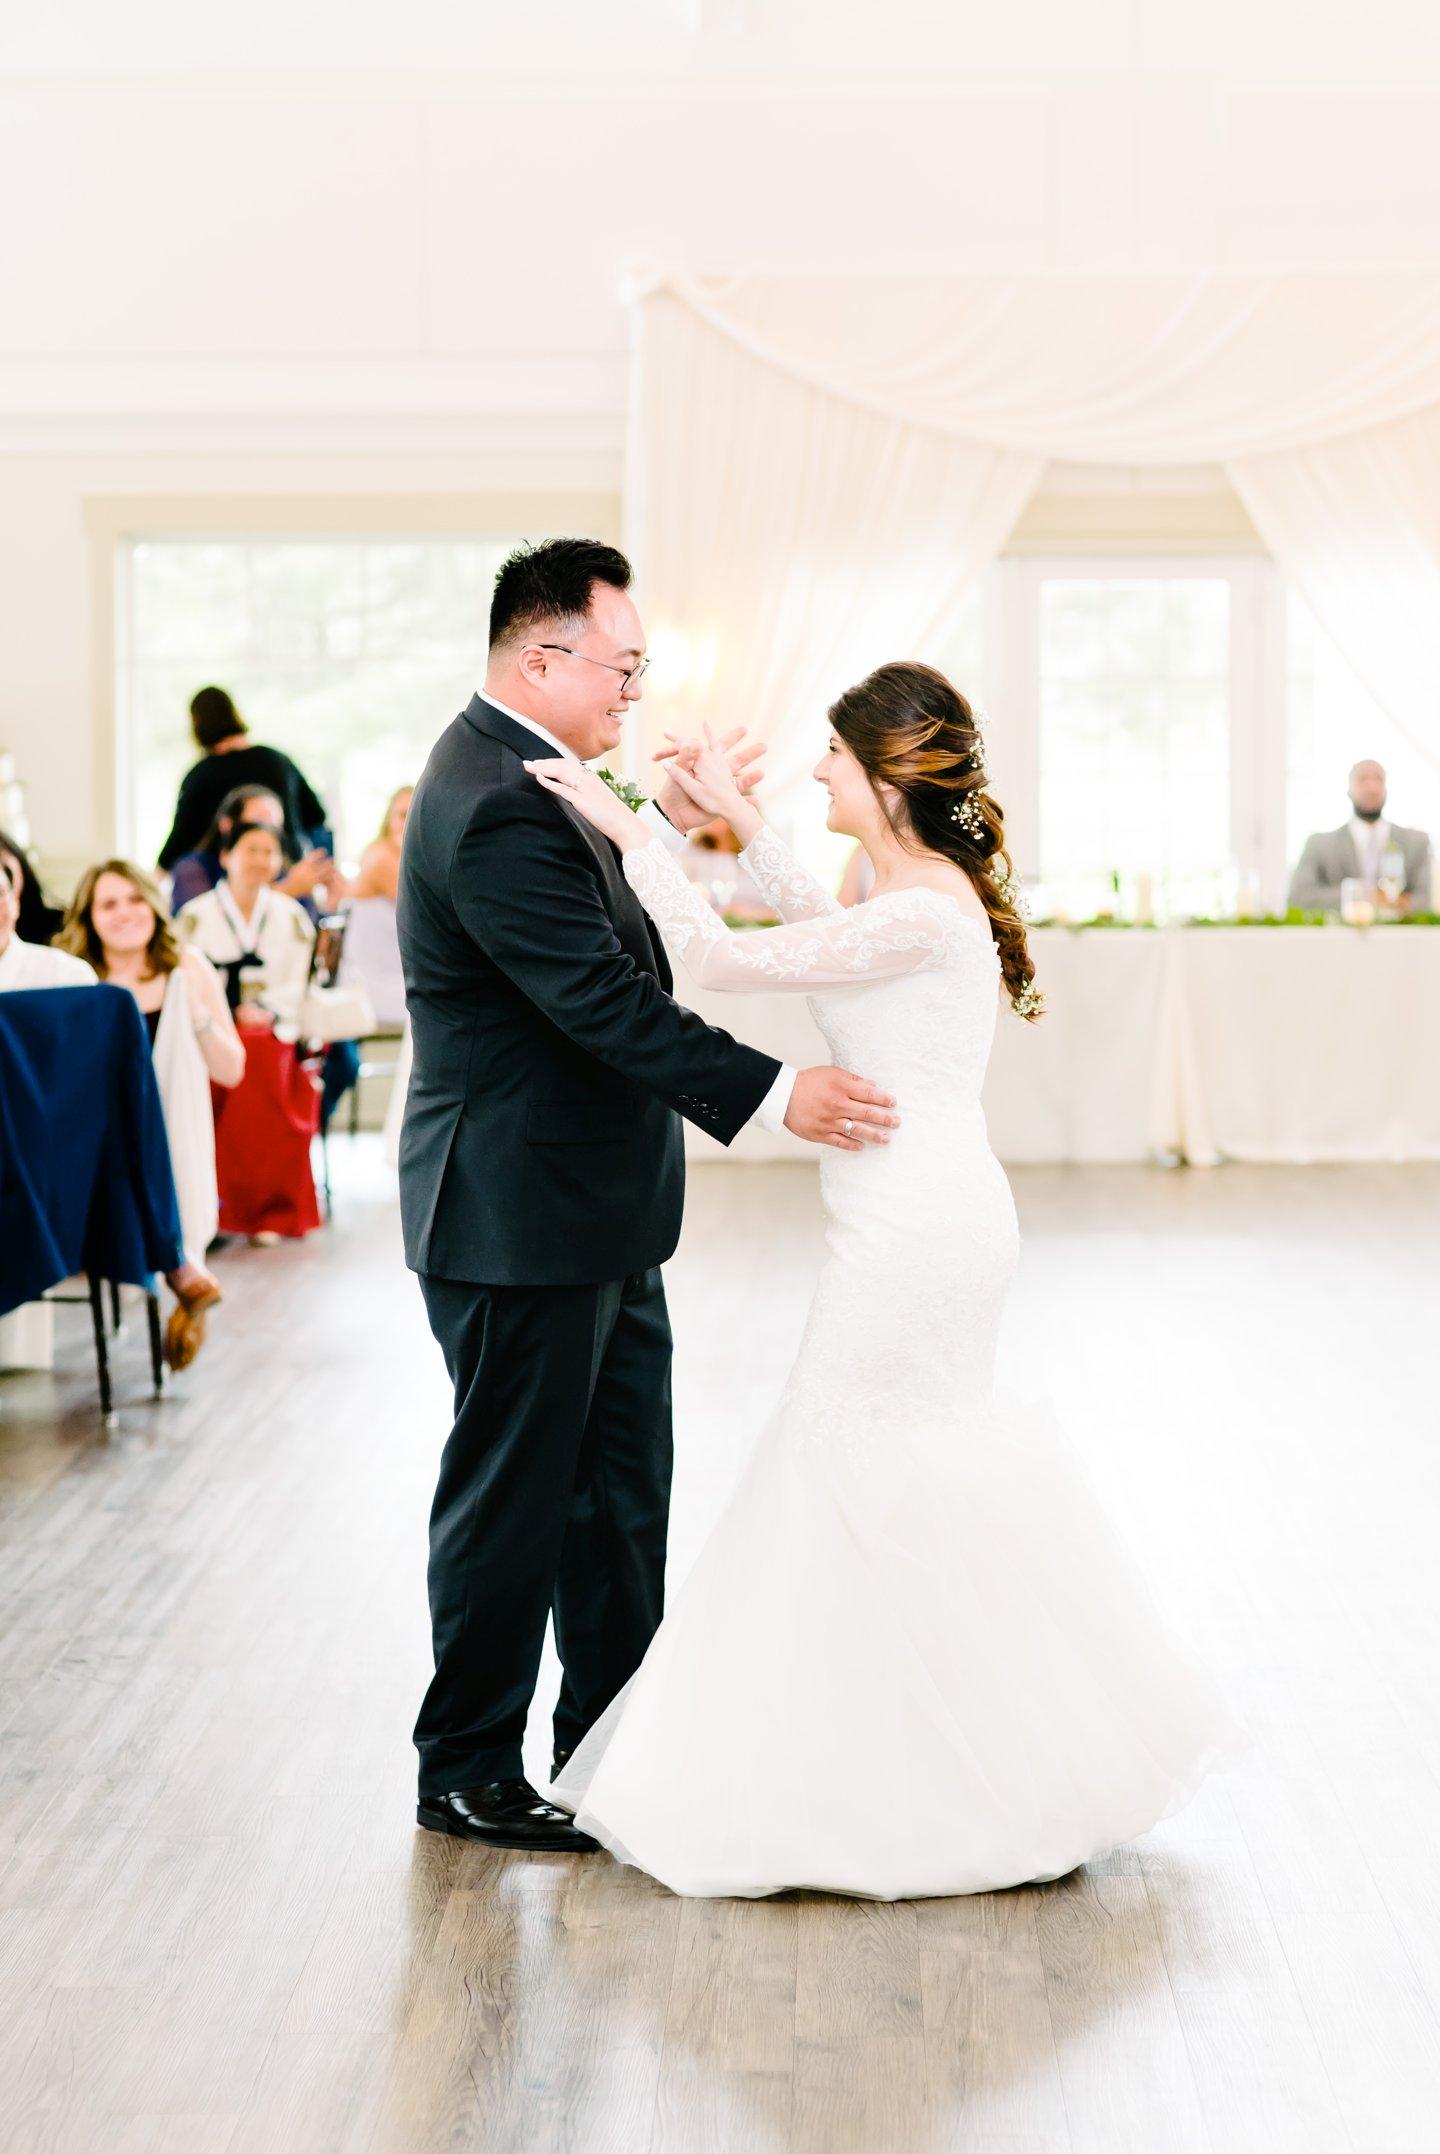 lake-geneva-fine-art-wedding-photographer-santos57